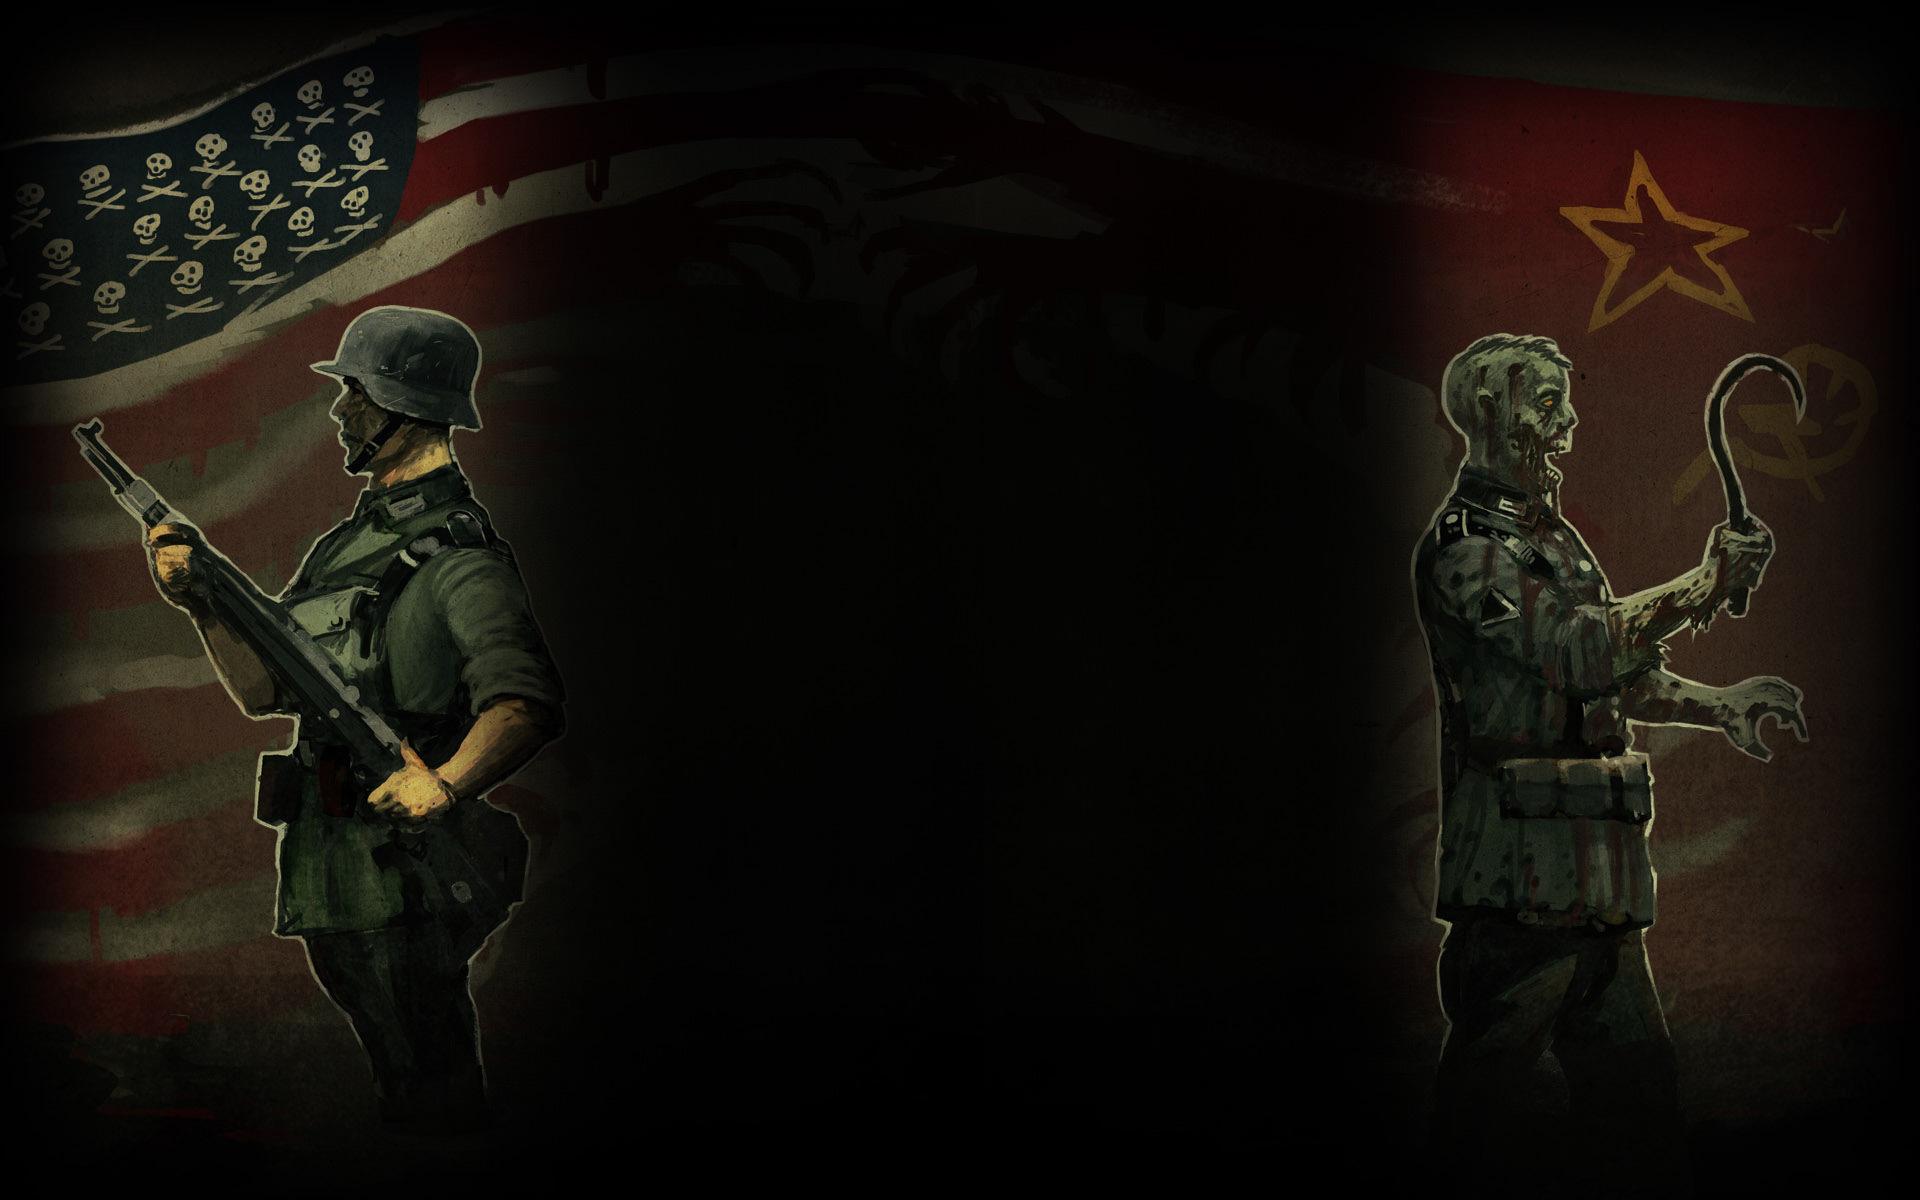 Sniper Elite Nazi Zombie Army Background Skulls and Stripes.jpg